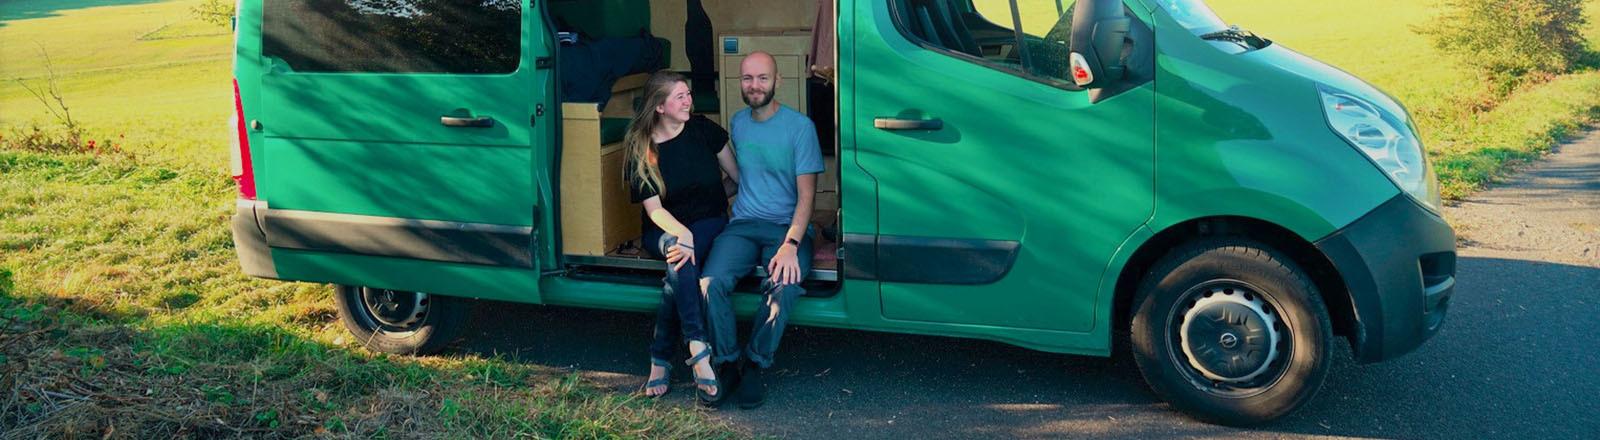 Julia und Helge Kunze in ihrem Transporter